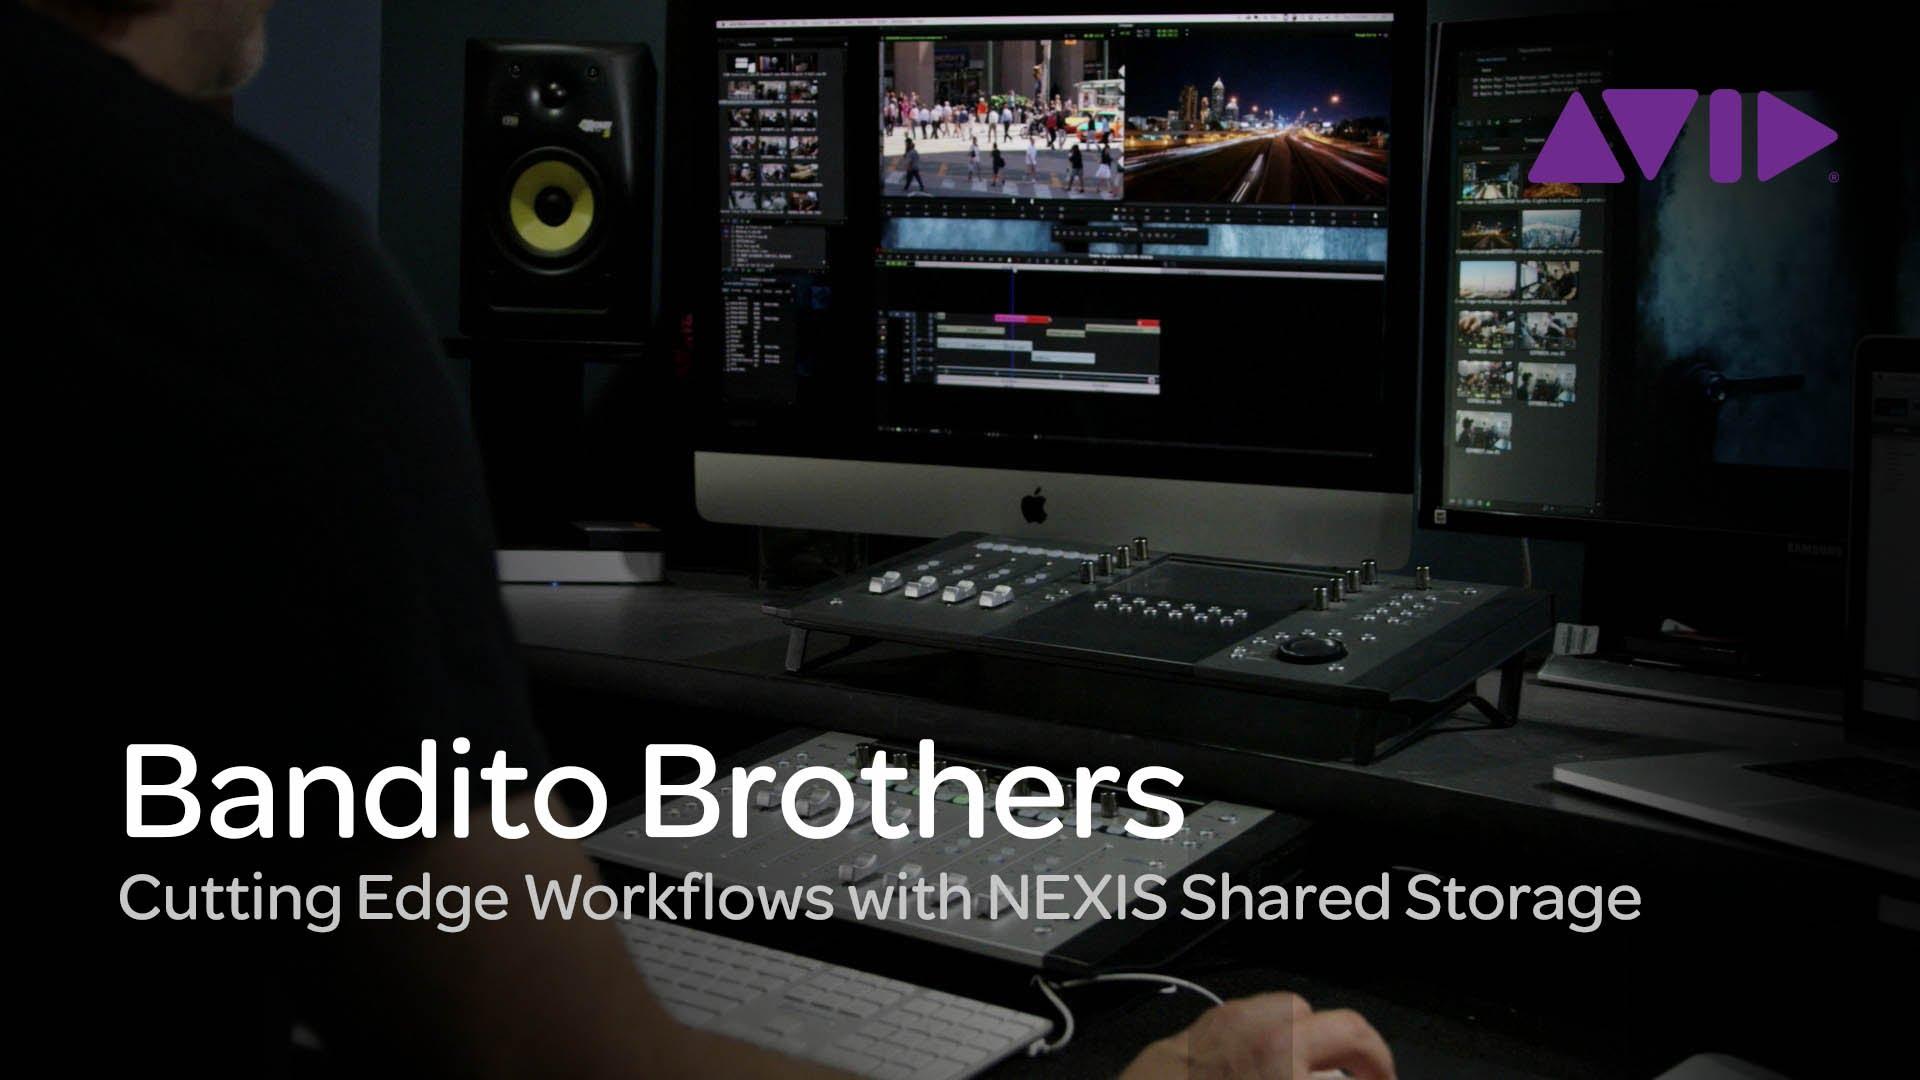 bandito-brothers-avid-nexis-pro